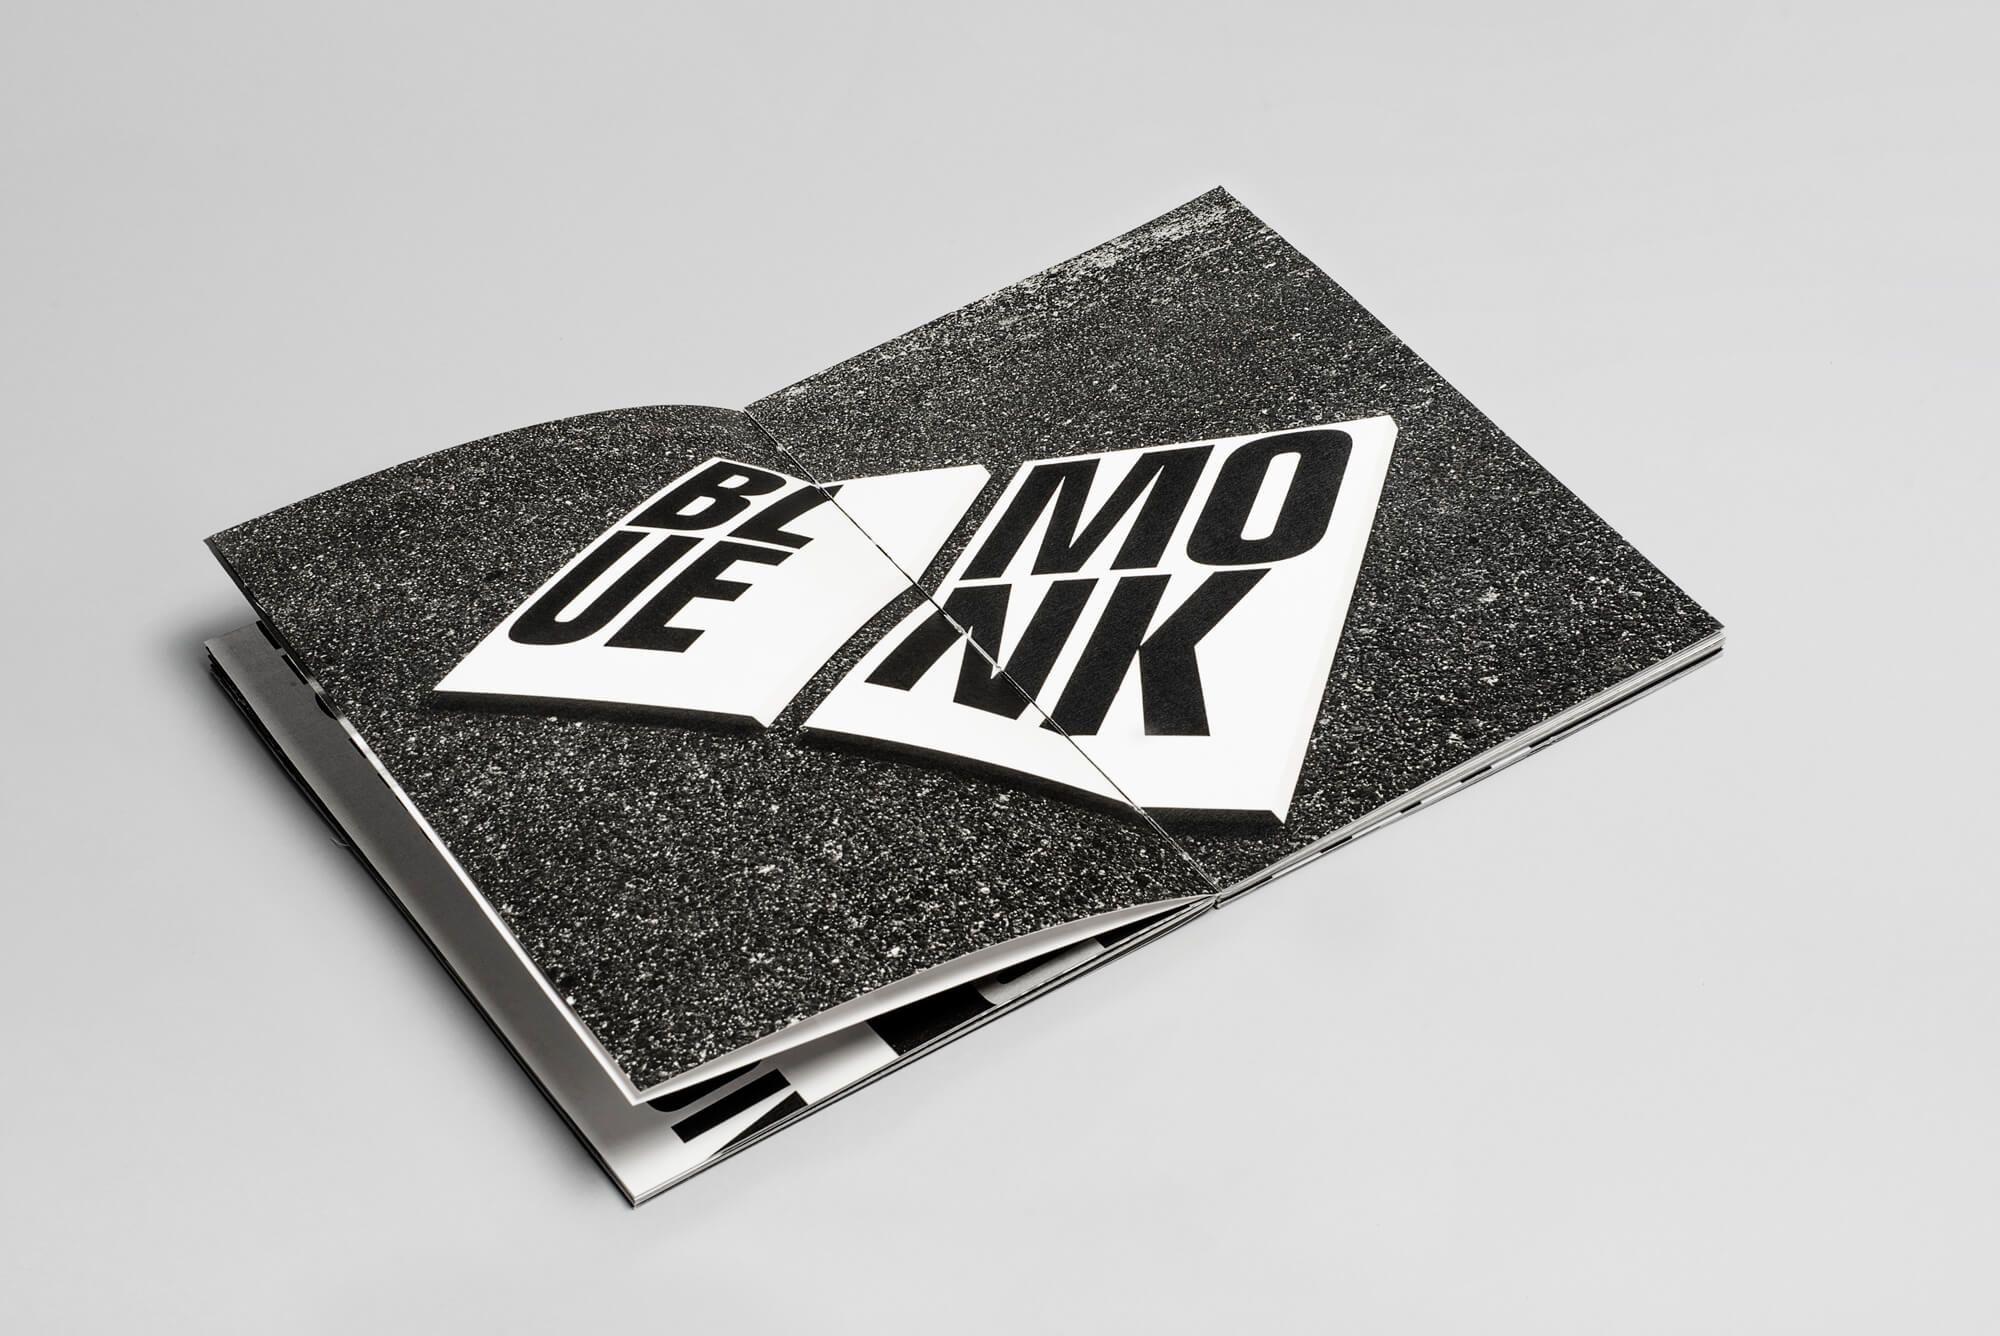 Design Studio Köln editorial painted words book | [ studio - design ] koln | pinterest